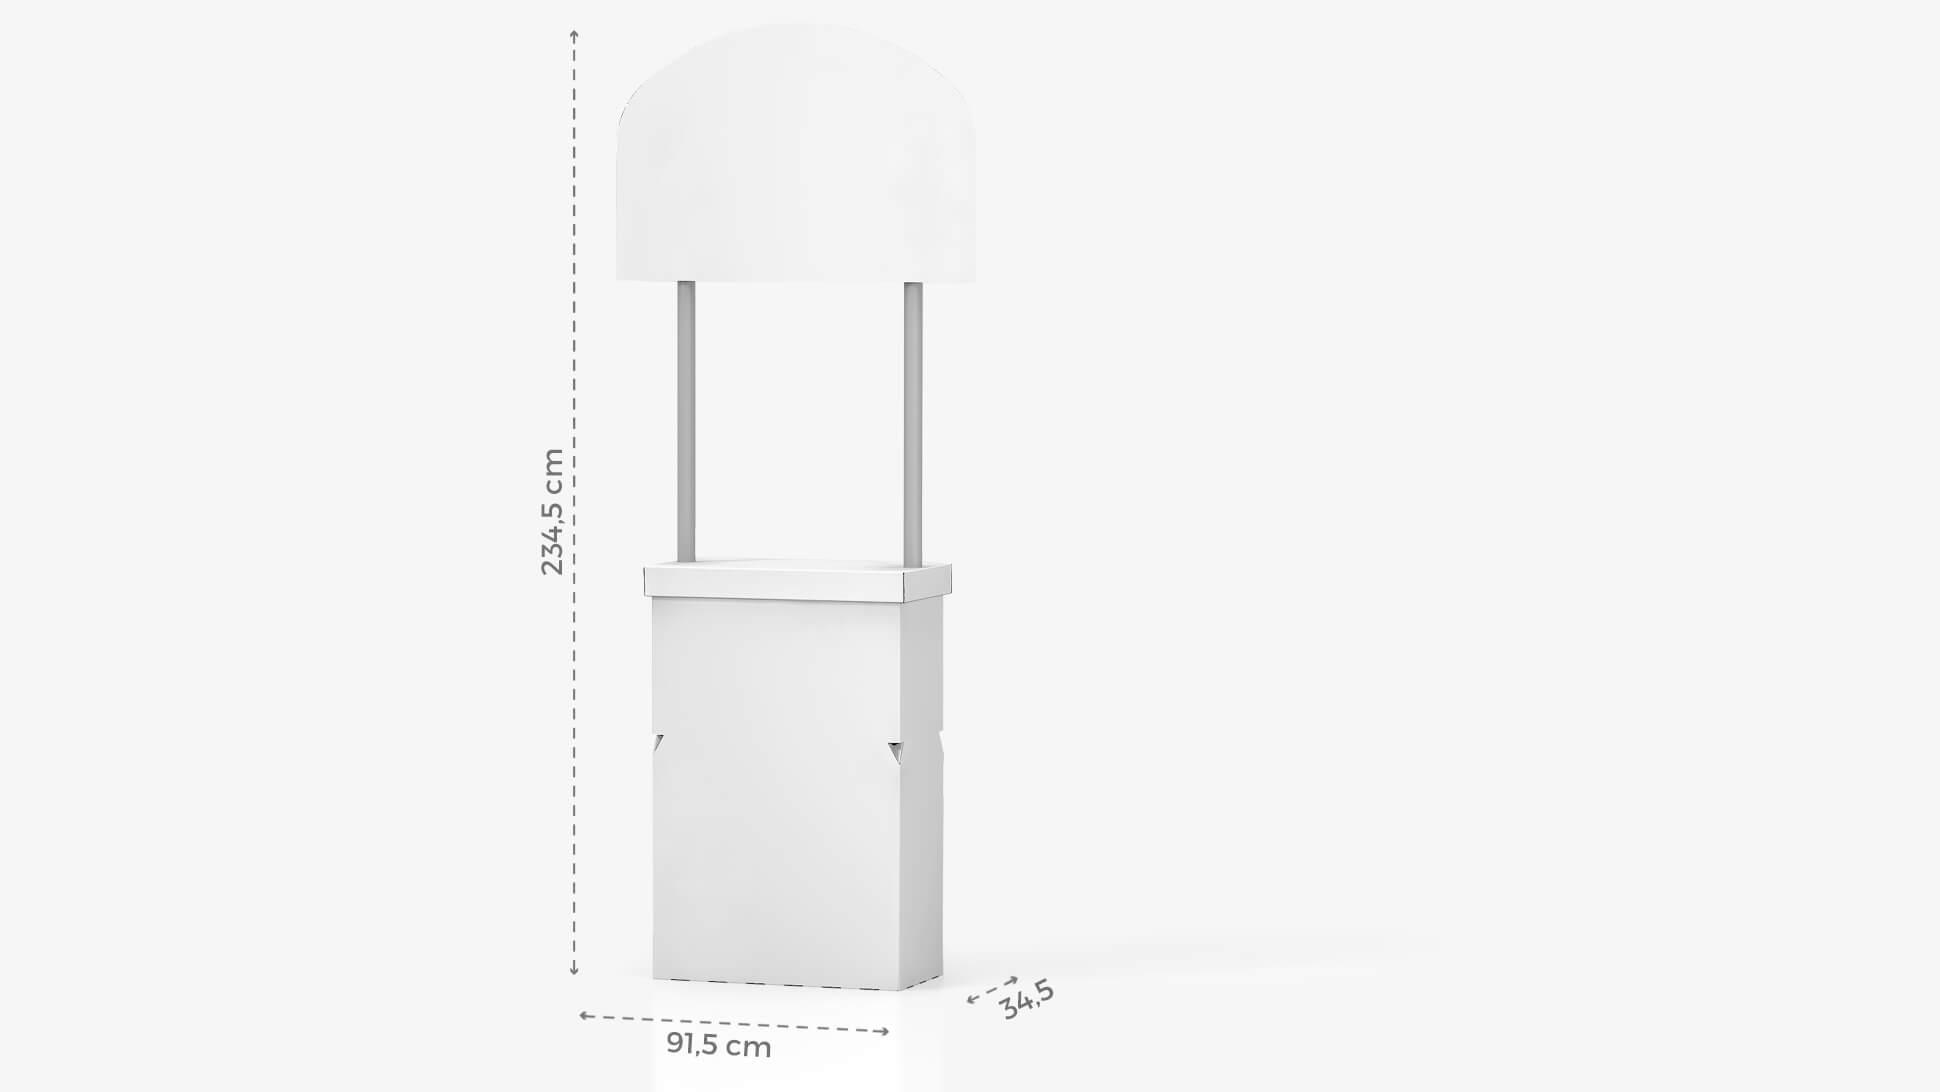 Desk con crowner personalizzabile h234,5 cm | tictac.it